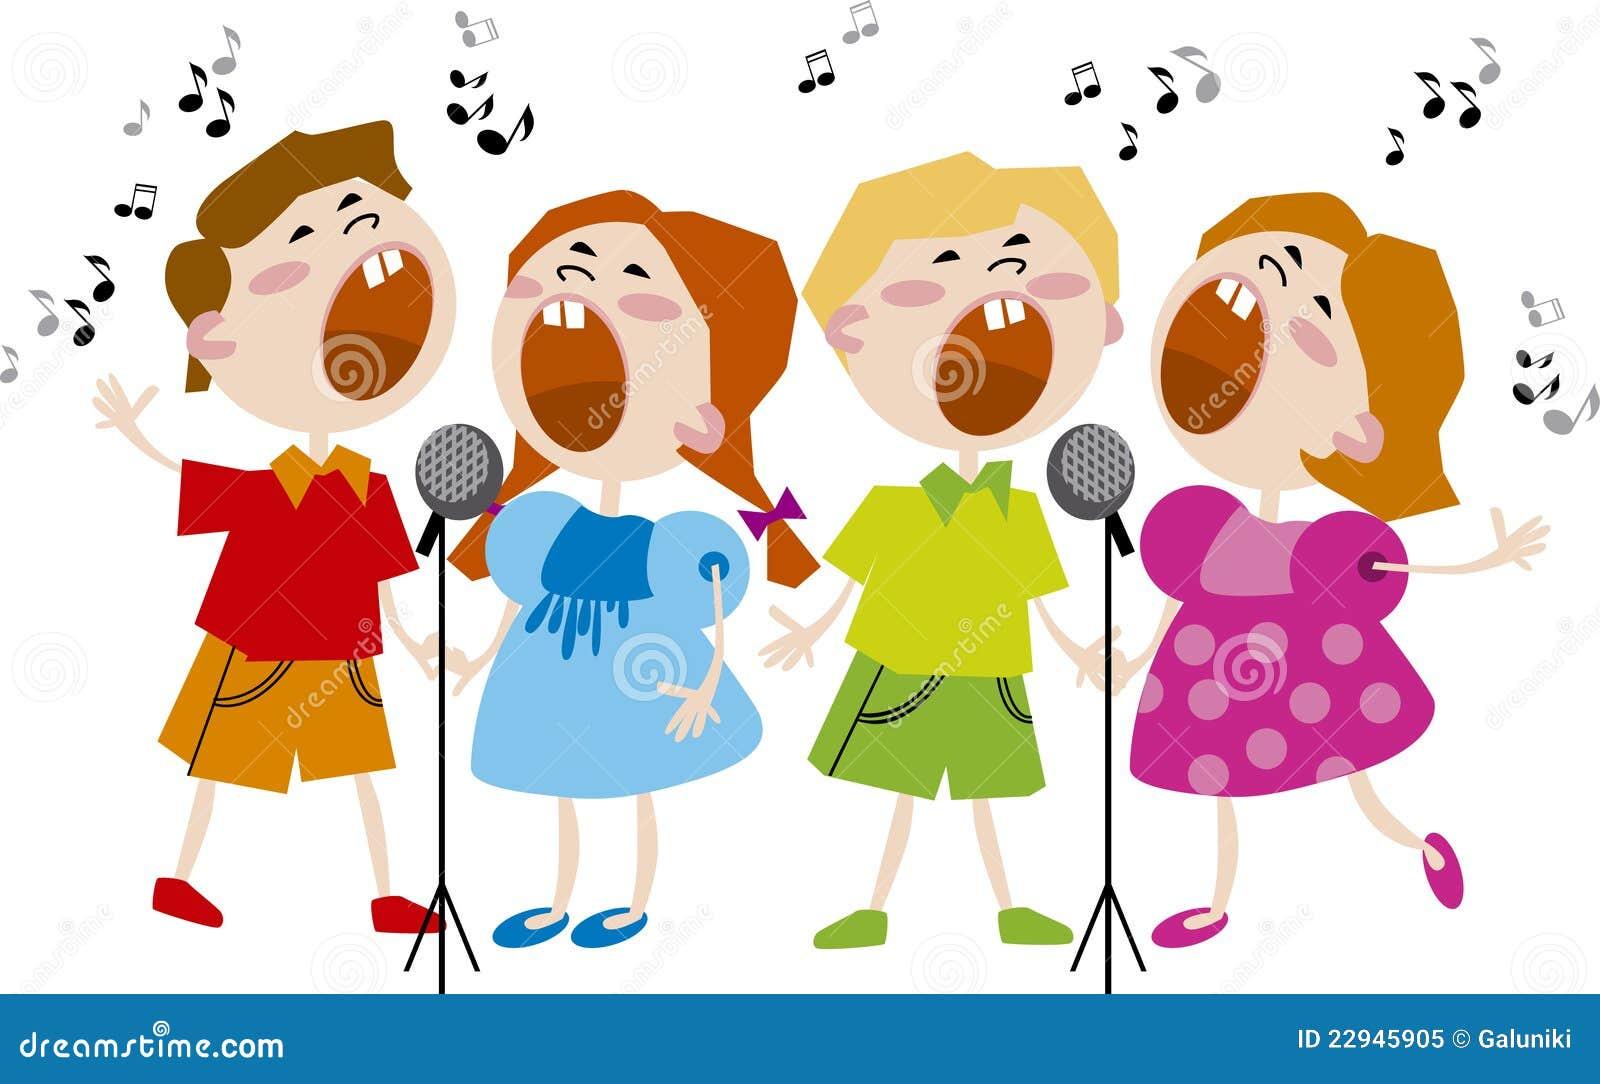 Kids Choir Royalty Free Stock Photo Image 22945905